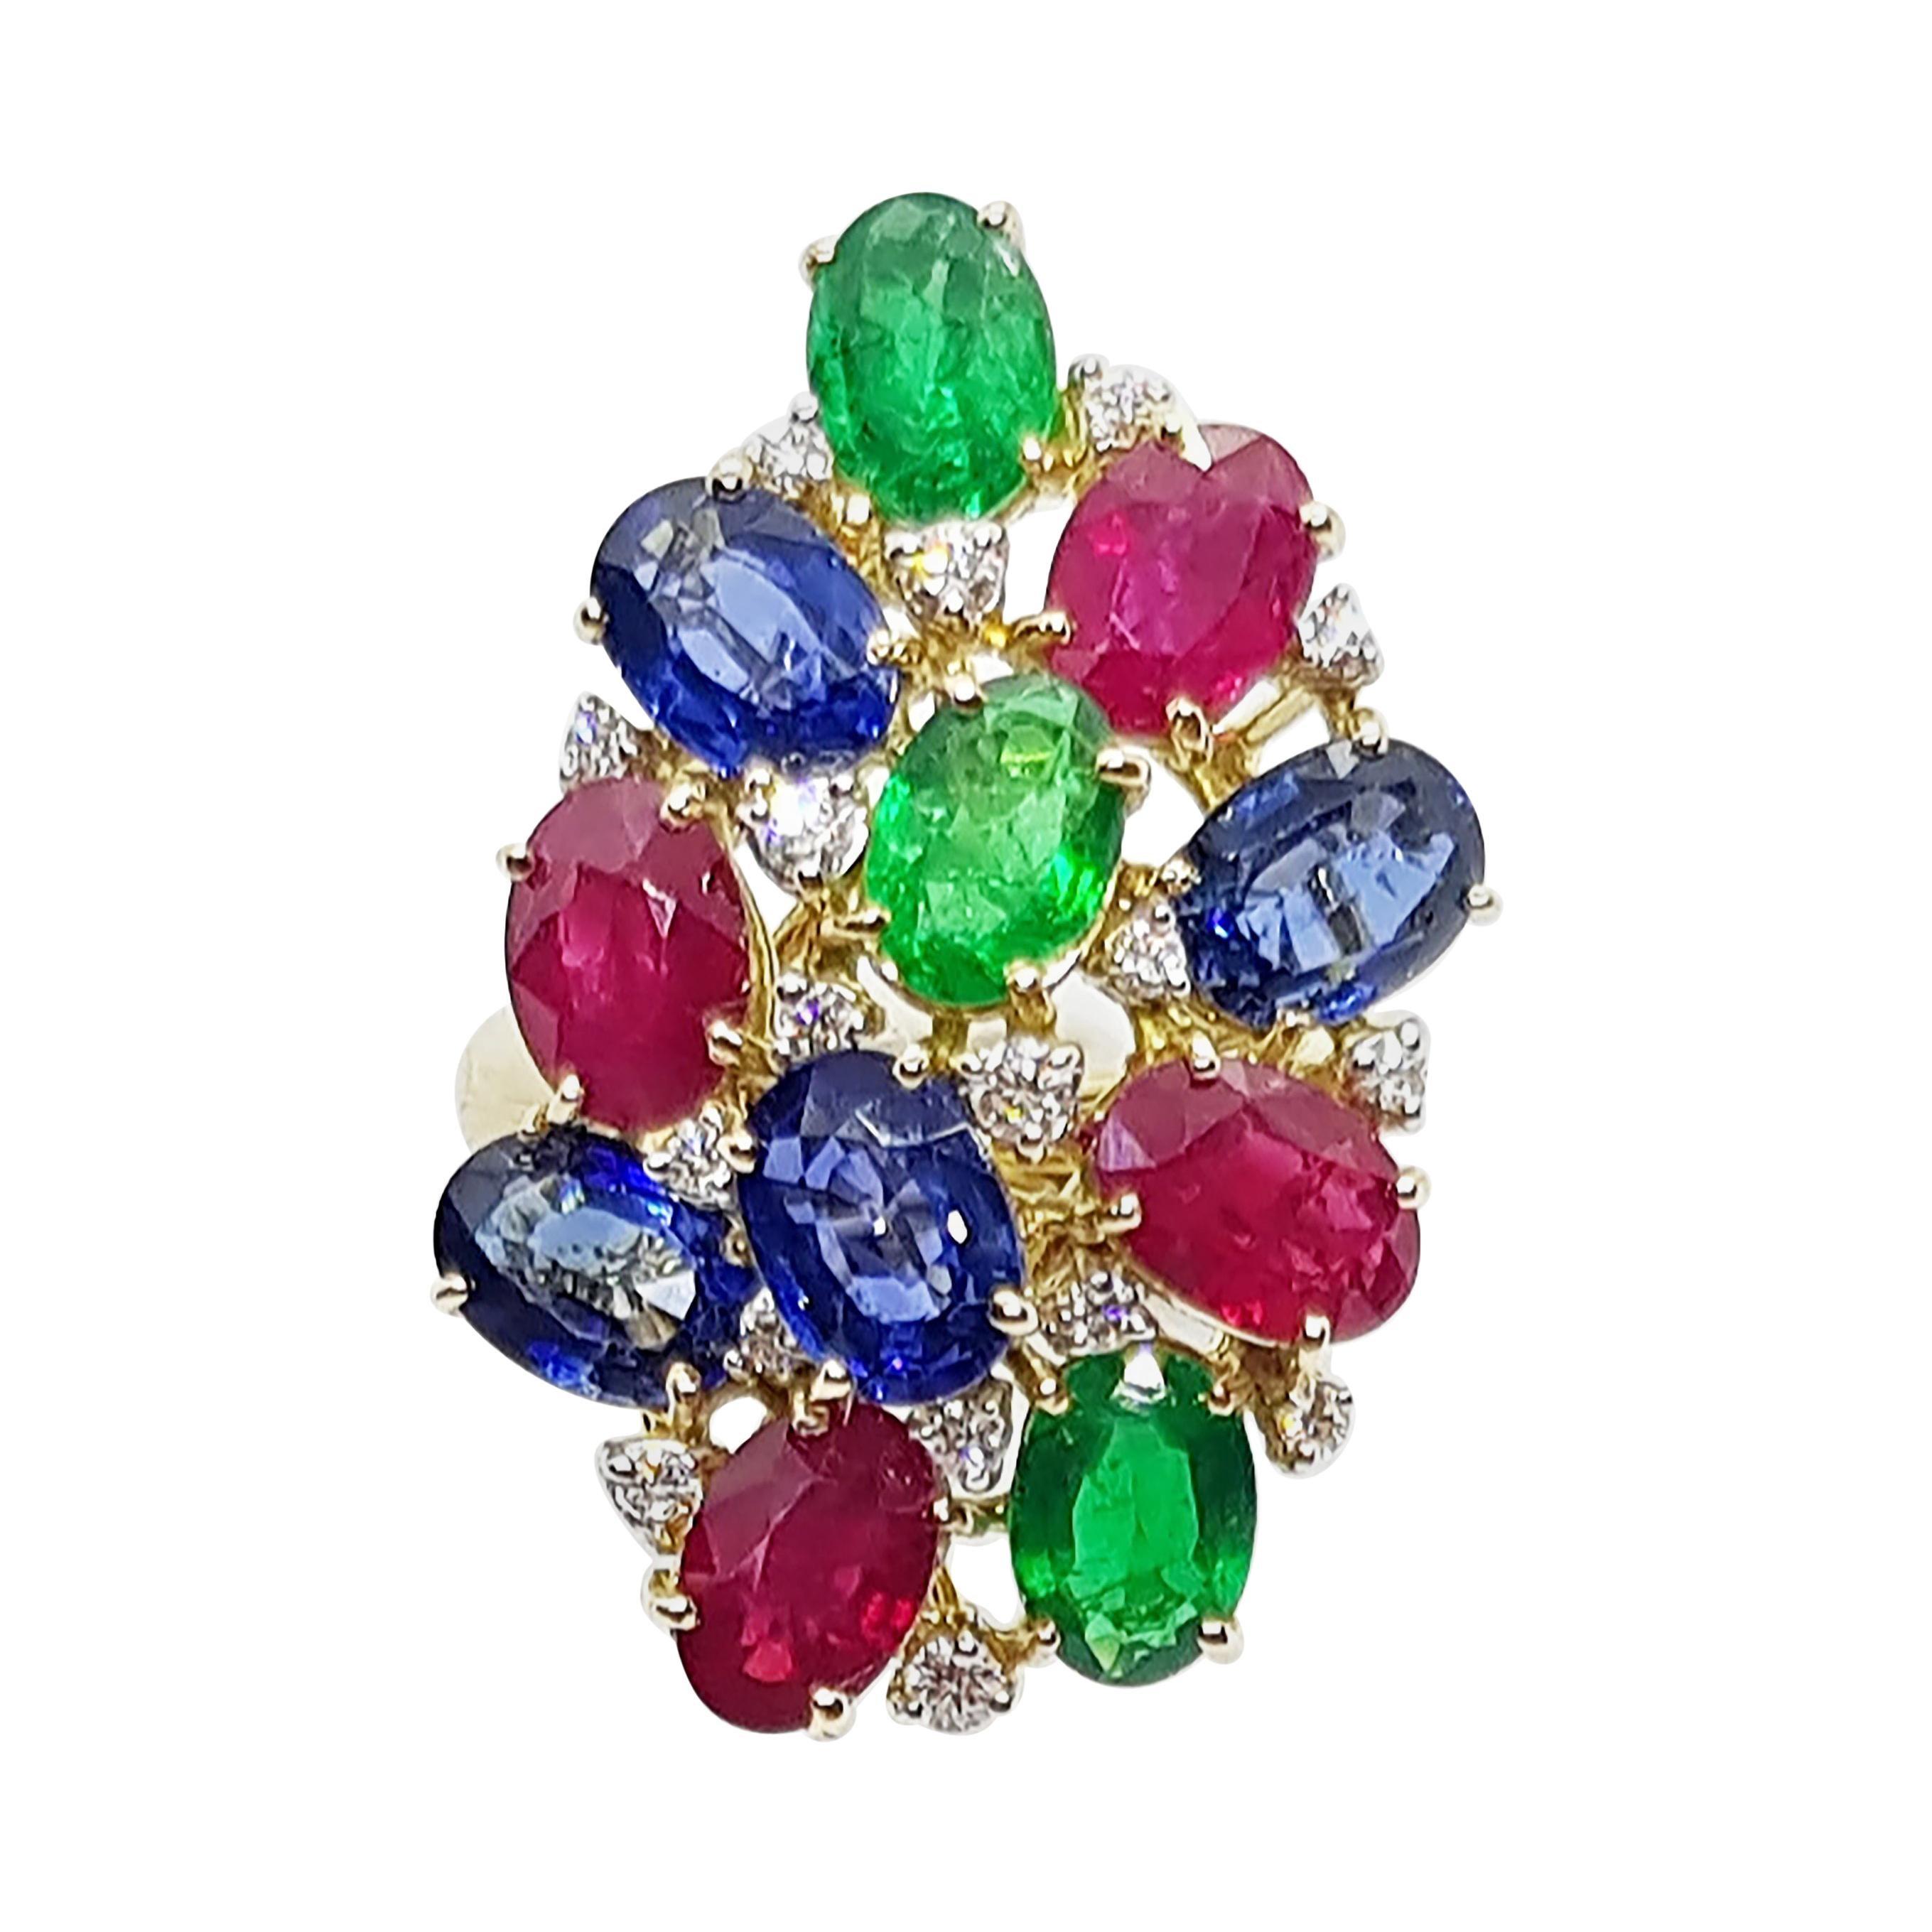 Blue Sapphire, Emerald, Ruby and Diamond Ring Set in 18 Karat White Gold Setting